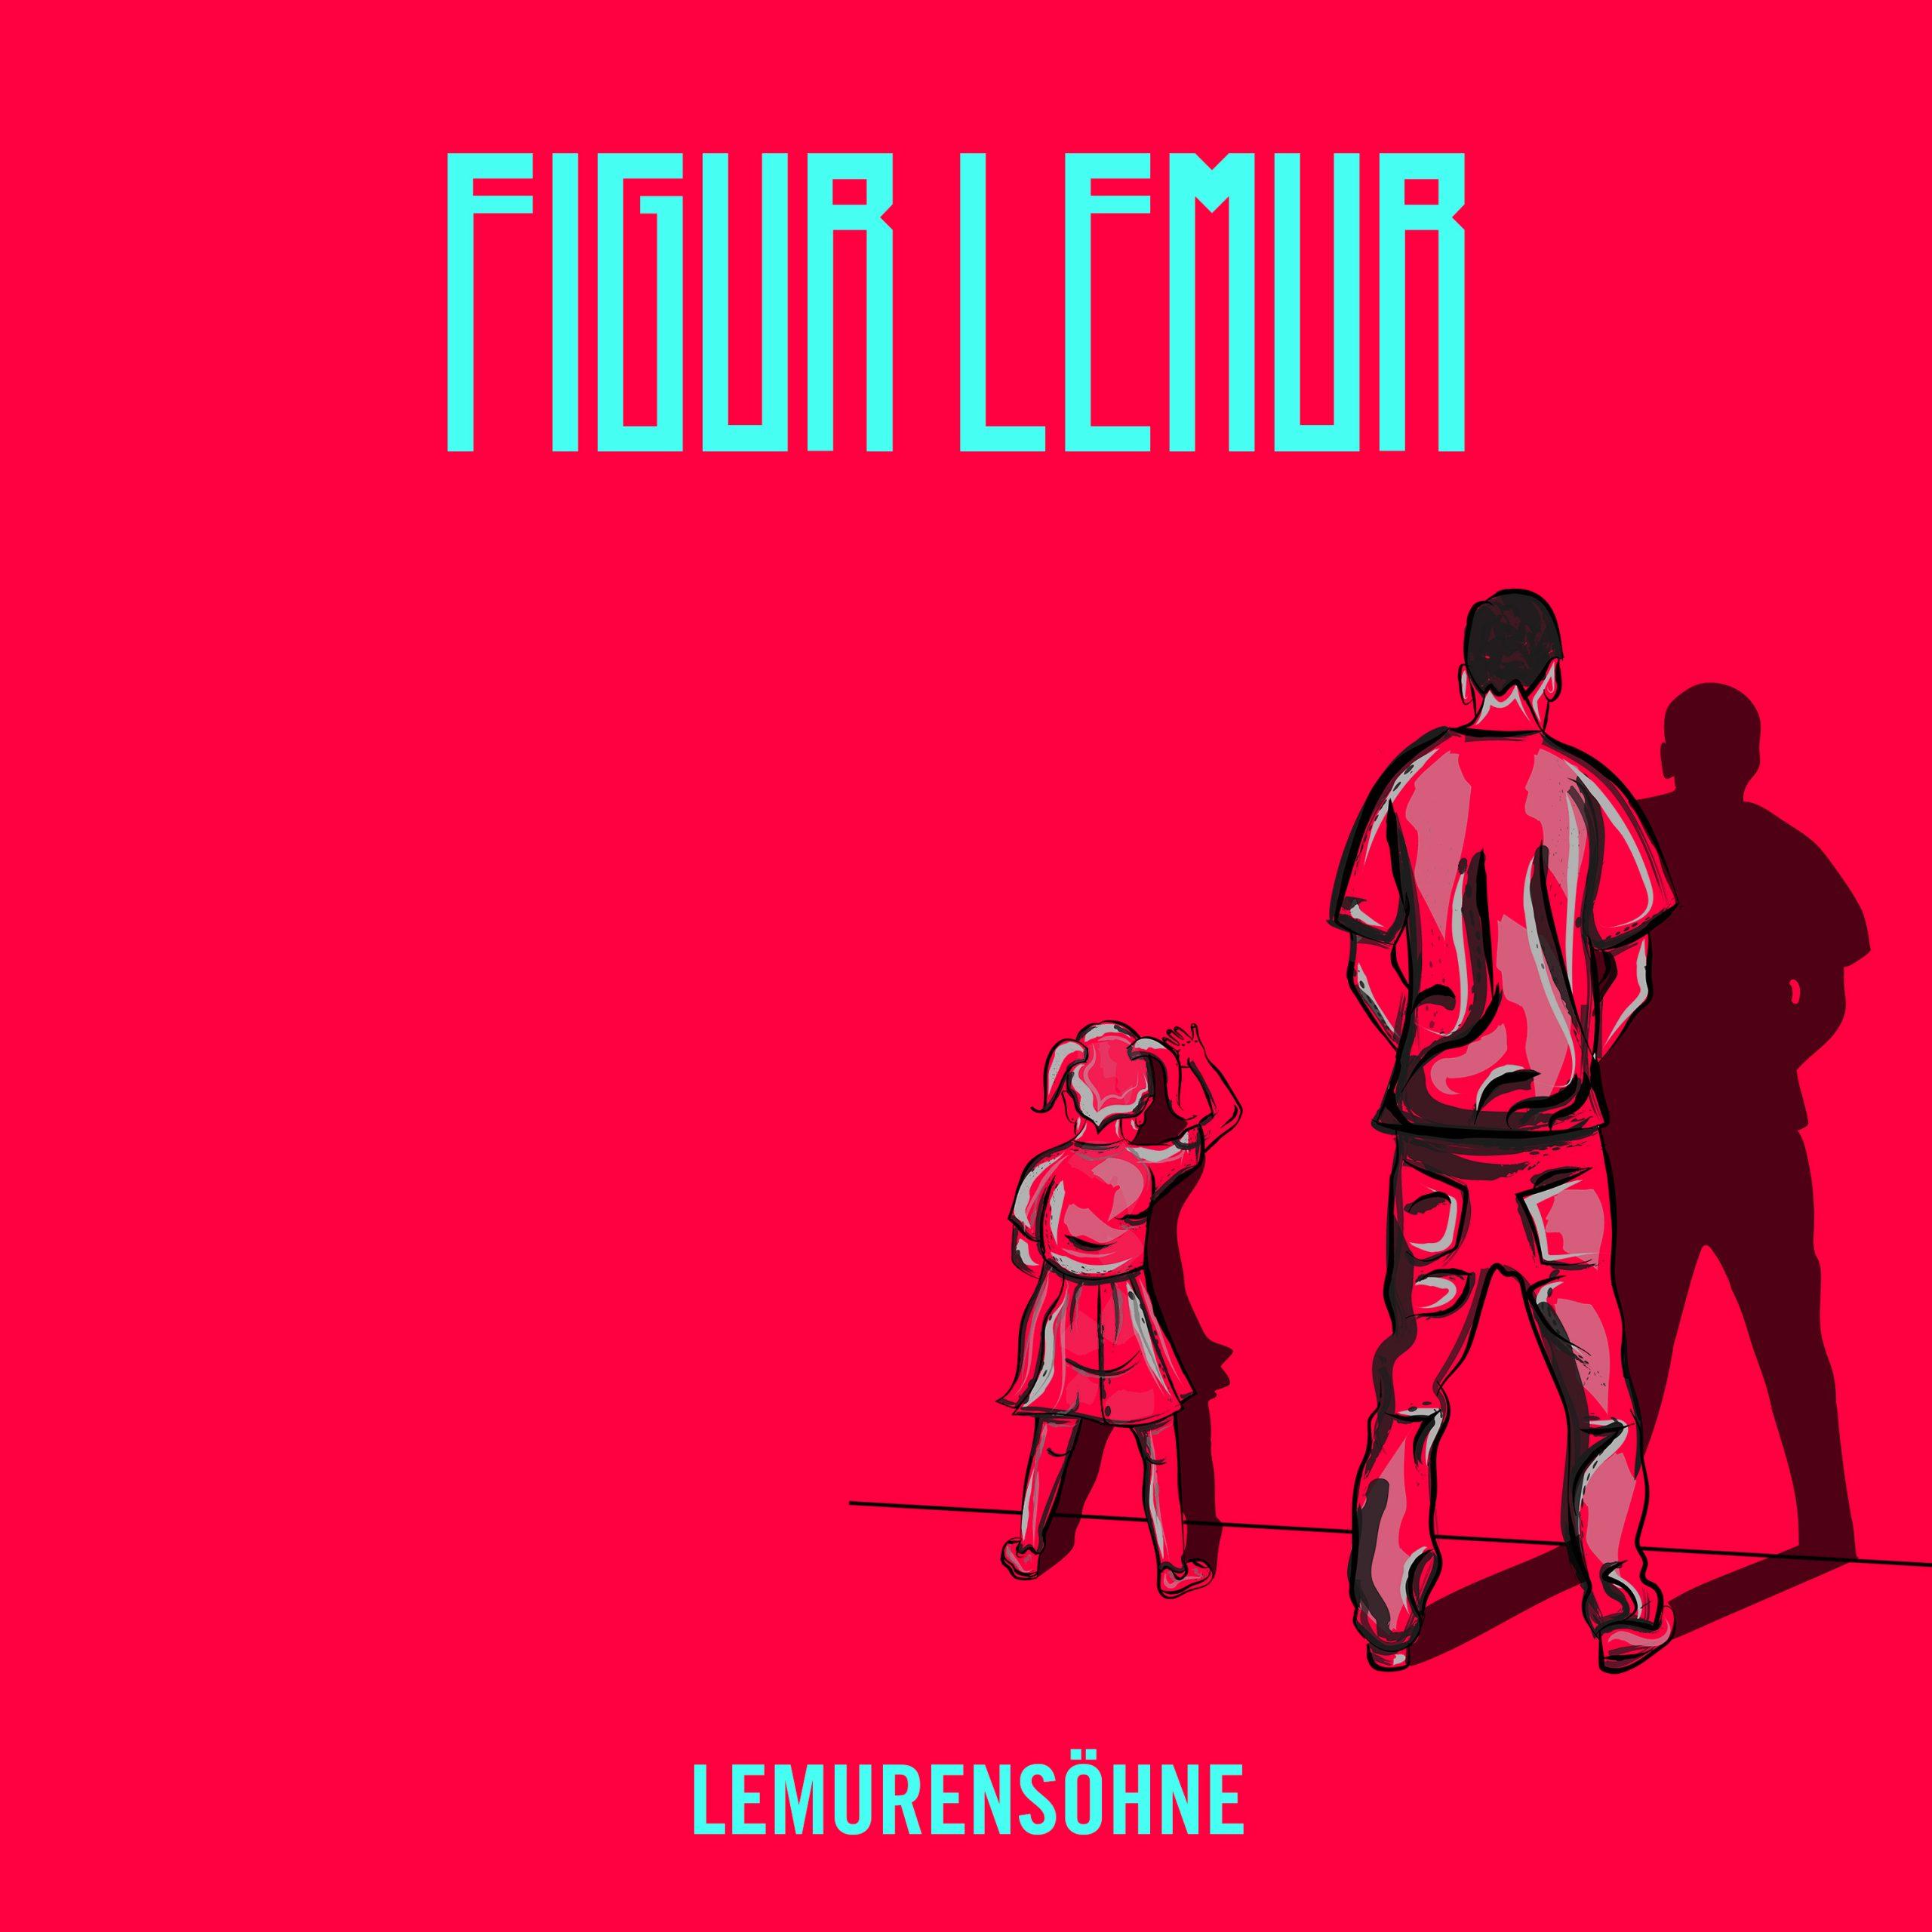 Figur Lemur - Lemurensöhne EP - Cover